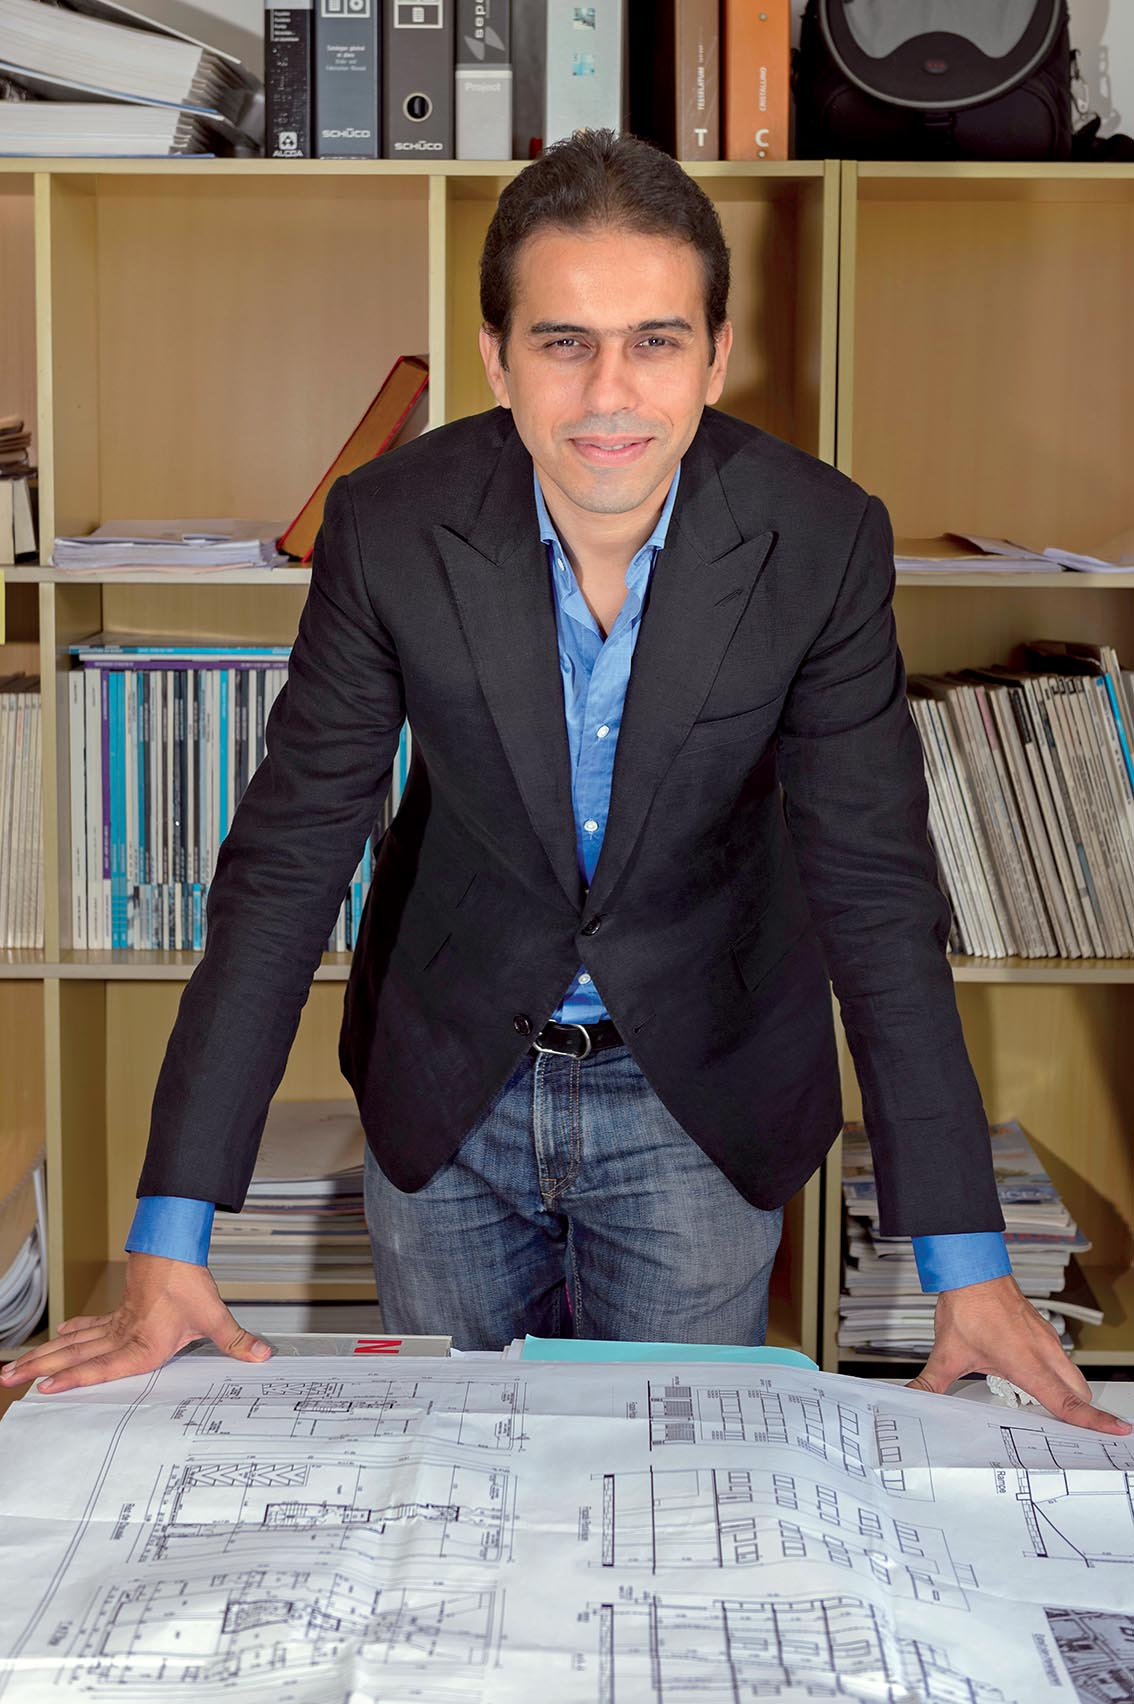 Mohamed amine siana la jeune garde de l architecture for Jeune architecte